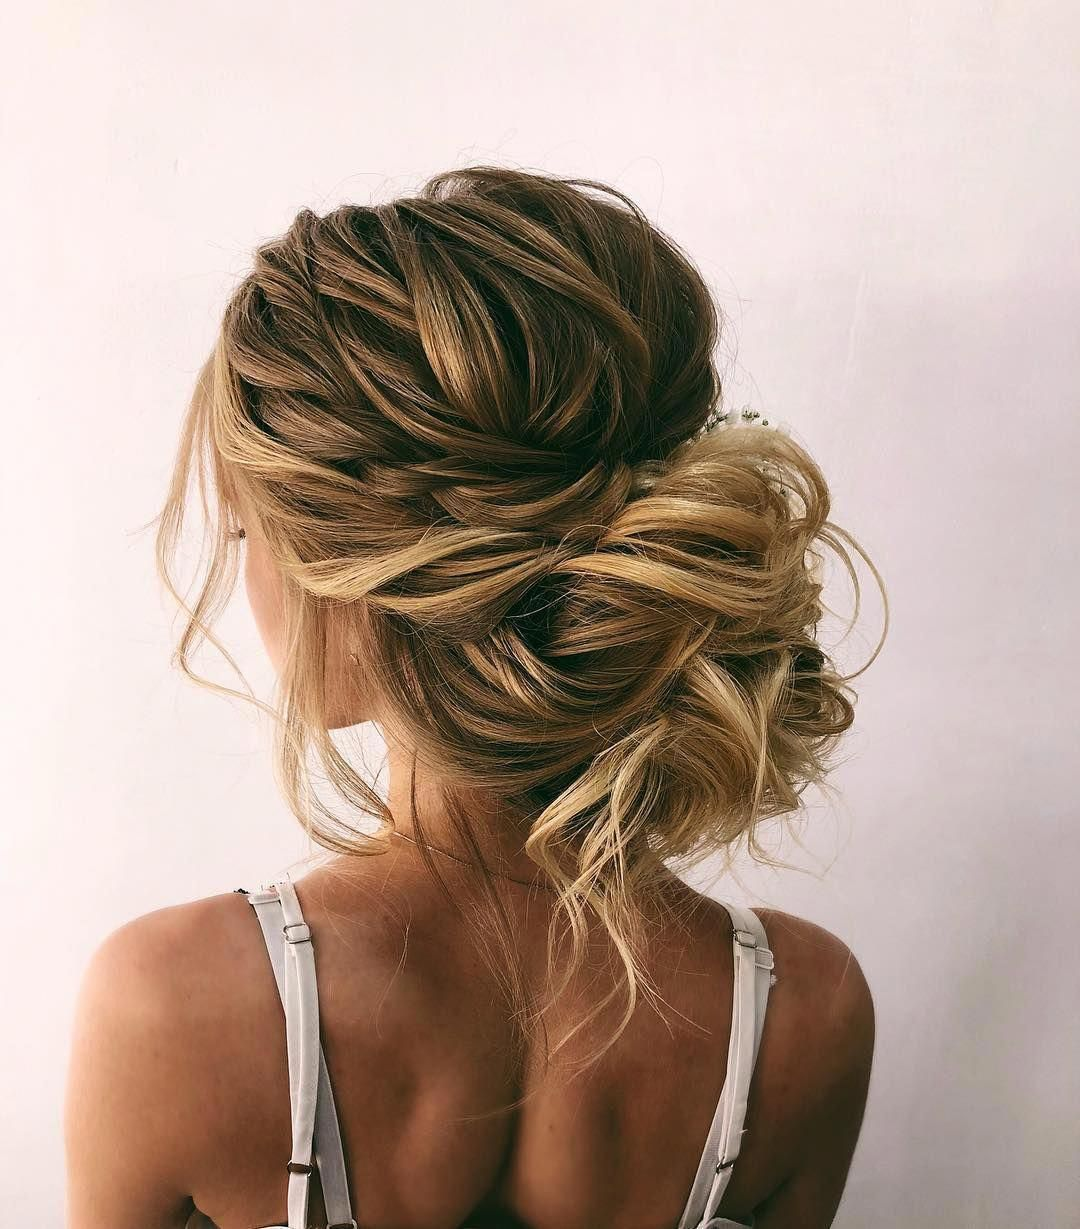 Easy Formal Hairstyles For Medium Hair Upstyles For Medium Hair Going Out Updo Styles 20190613 Easyformal Hair Styles Easy Formal Hairstyles Hair Upstyles